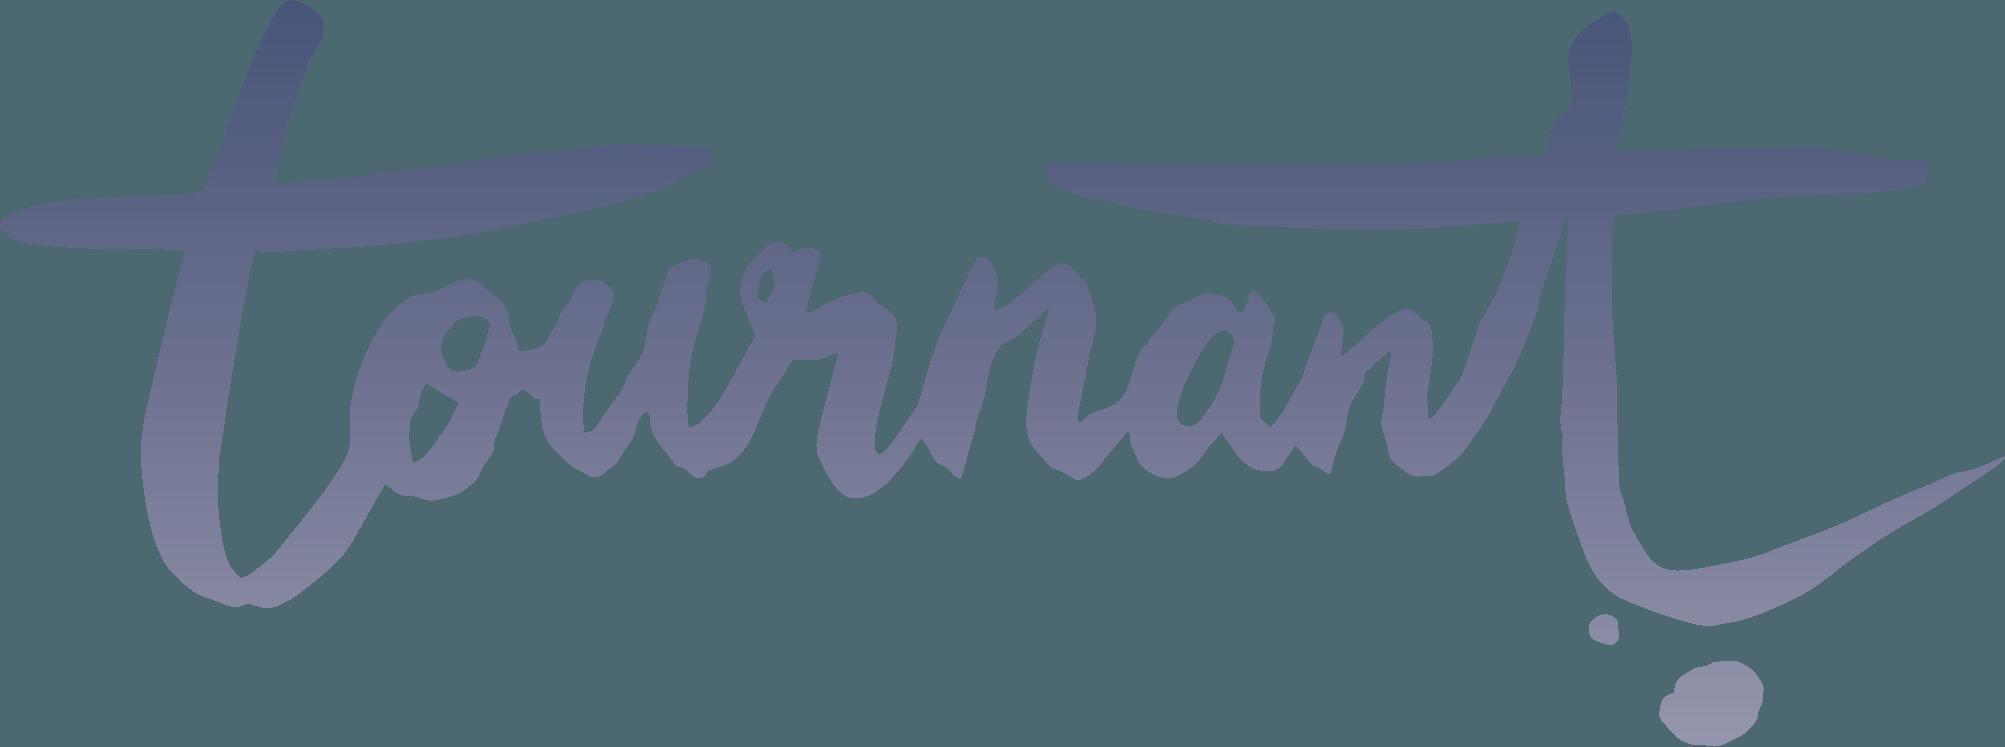 tournant-gradient-logo.png